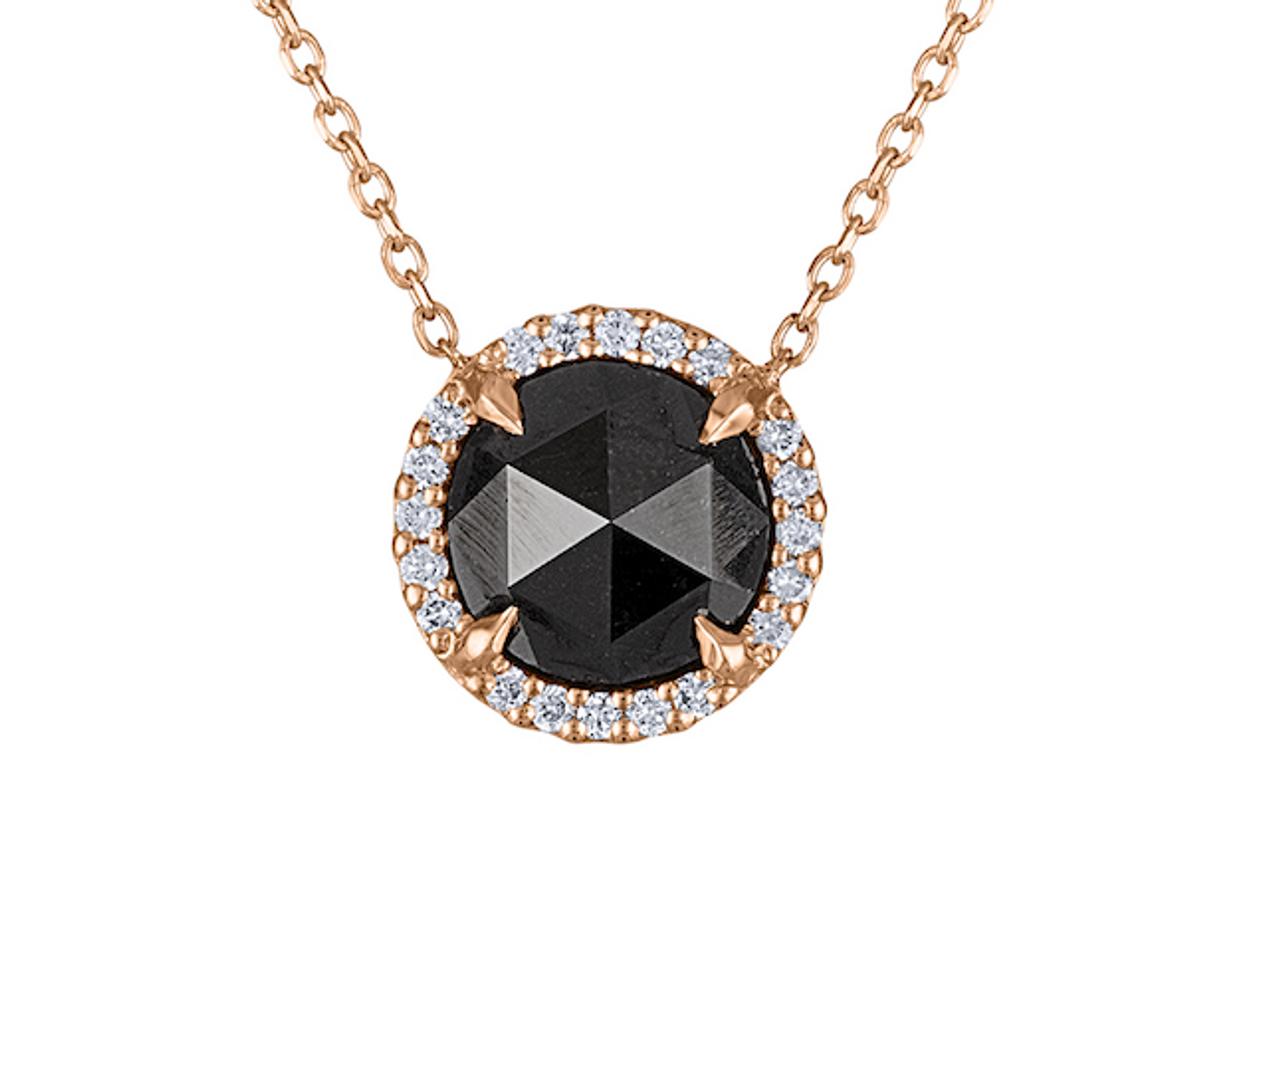 Bold Artistic Designed Citrine /& DIamond Necklace Pendant